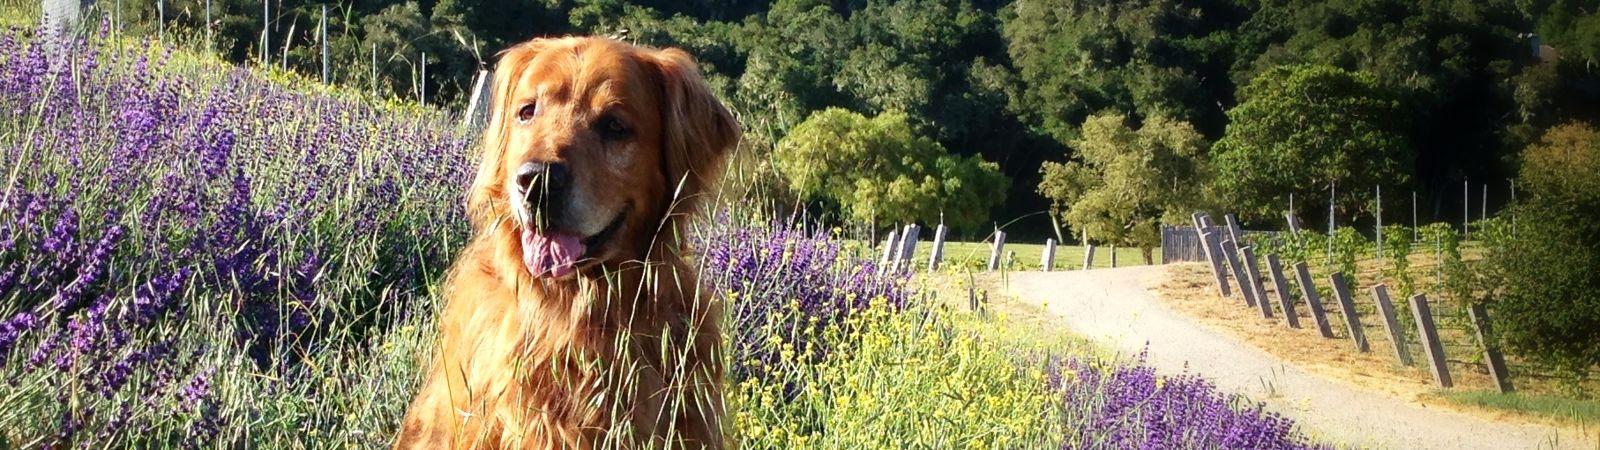 Carmel Valley Ranch_Pets_dog in lavender field